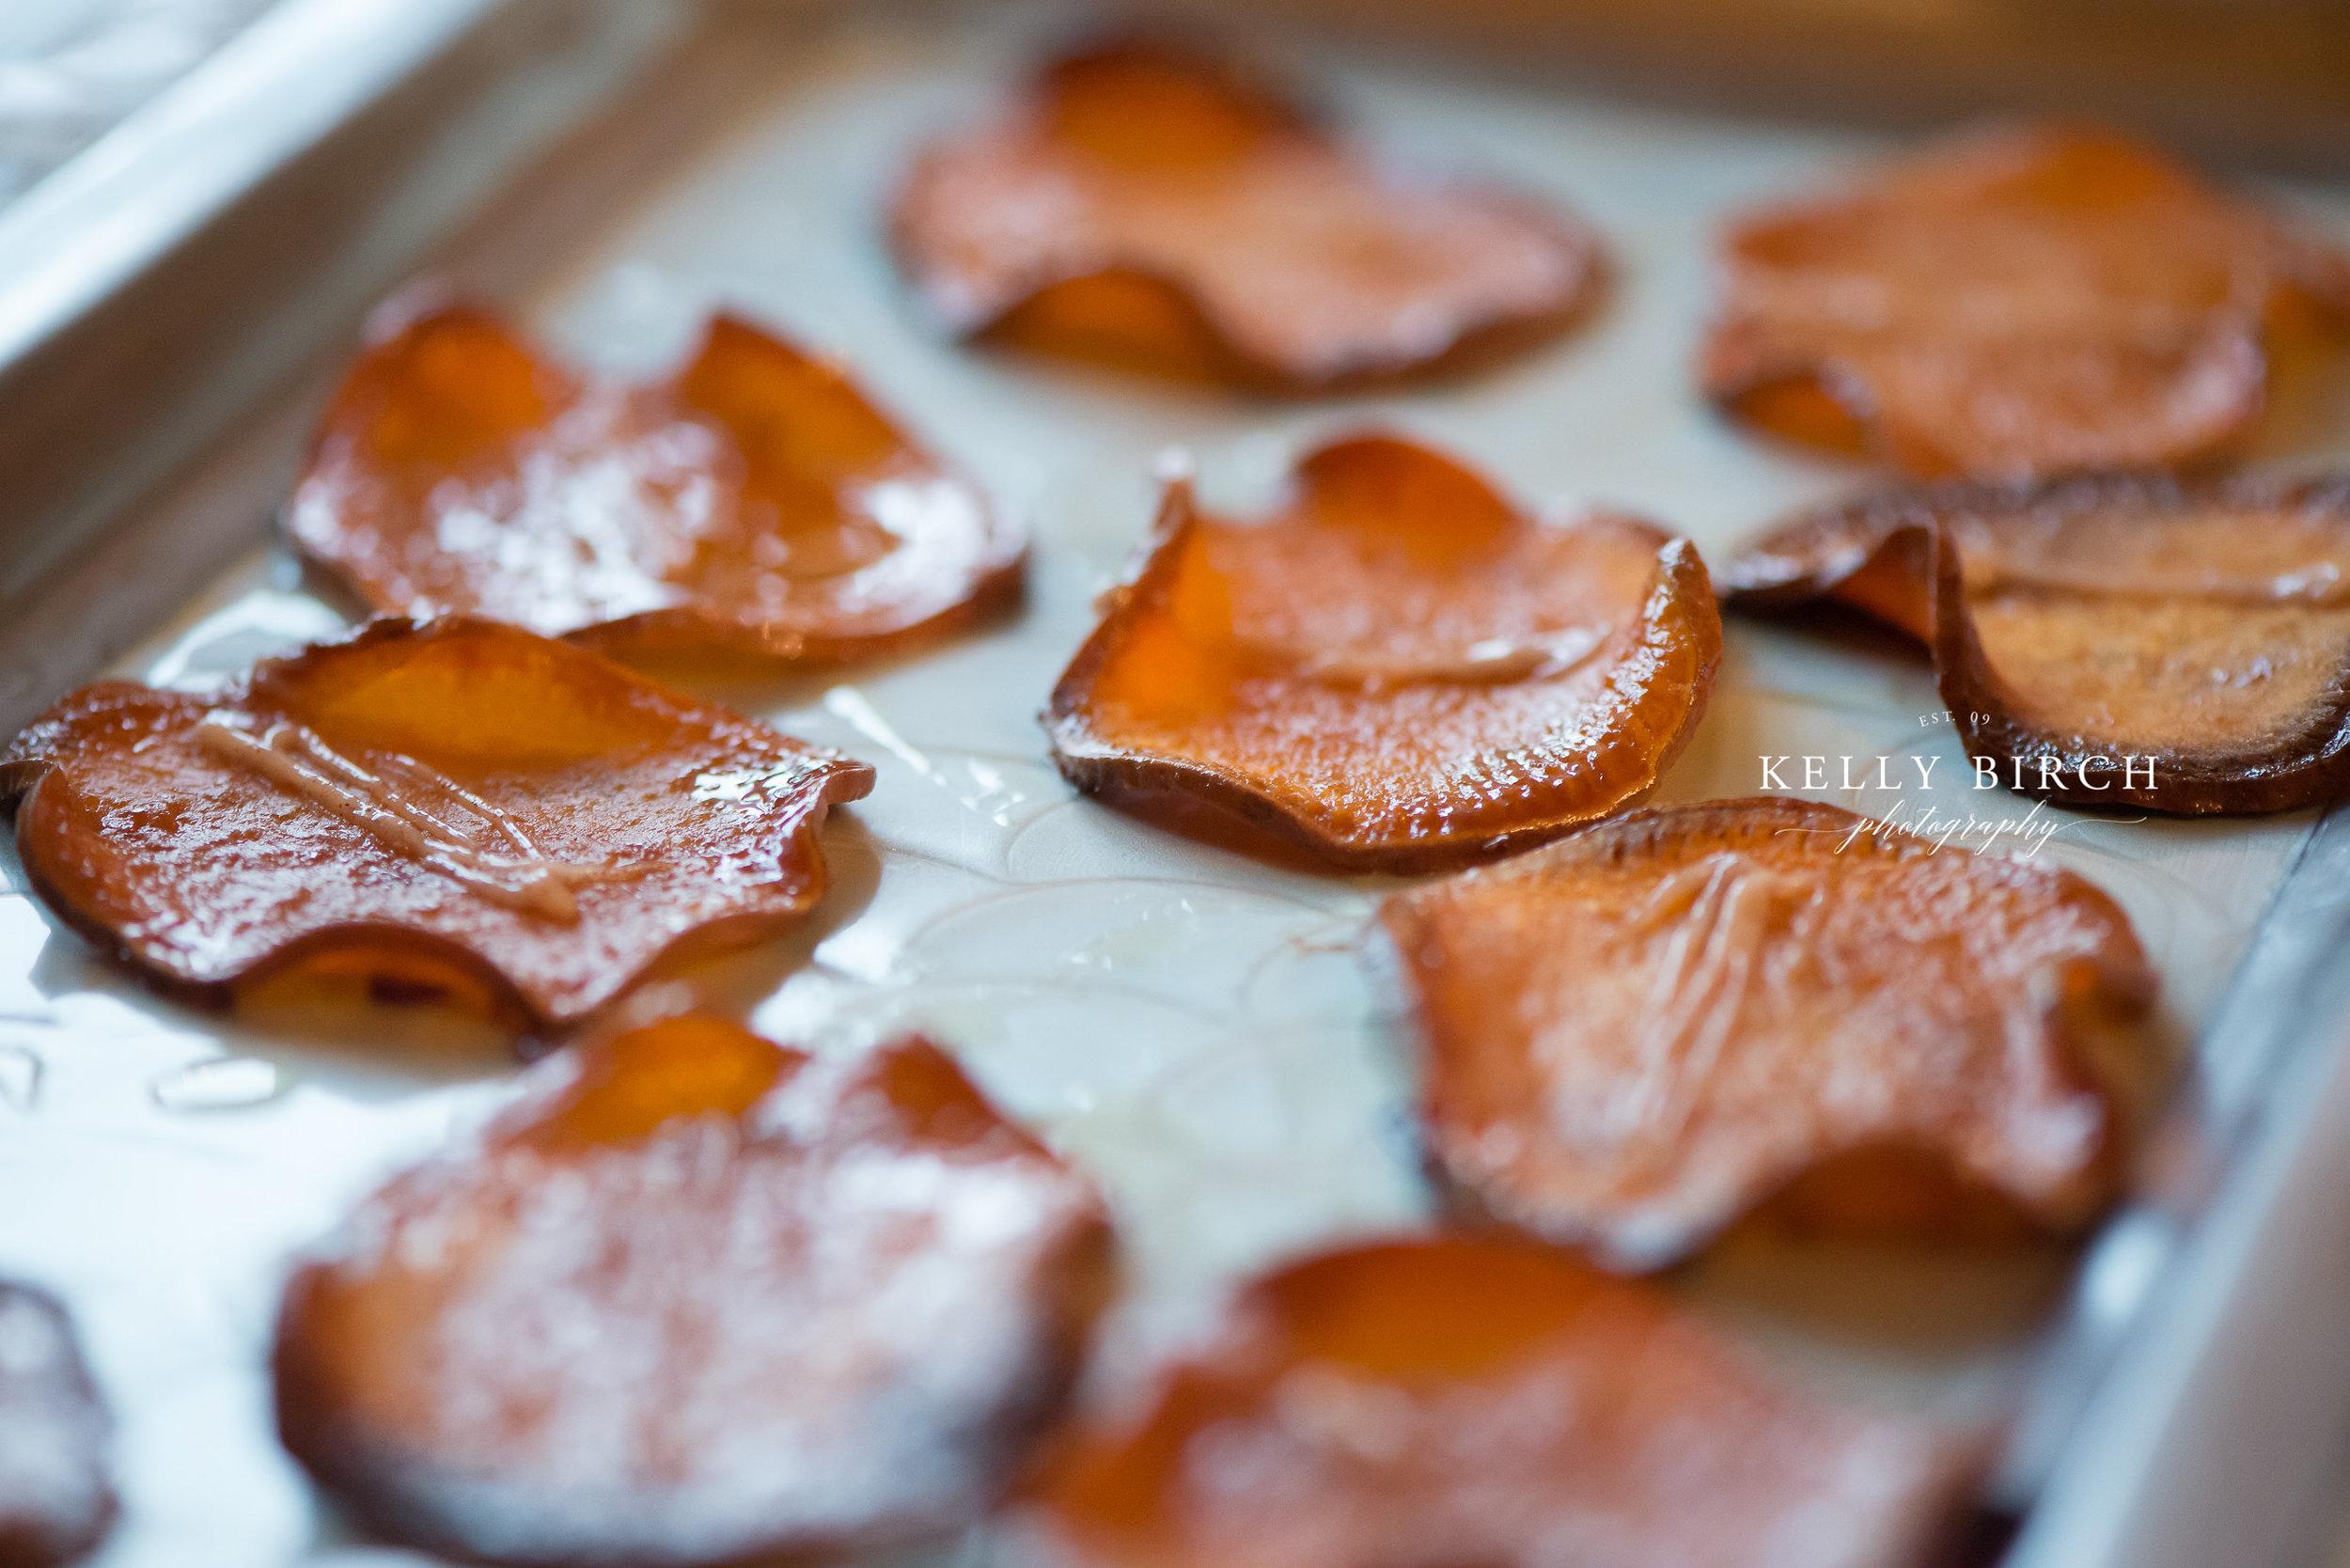 Wedding appetizer sweet potato crisps   Photo by Kelly Birch Photography